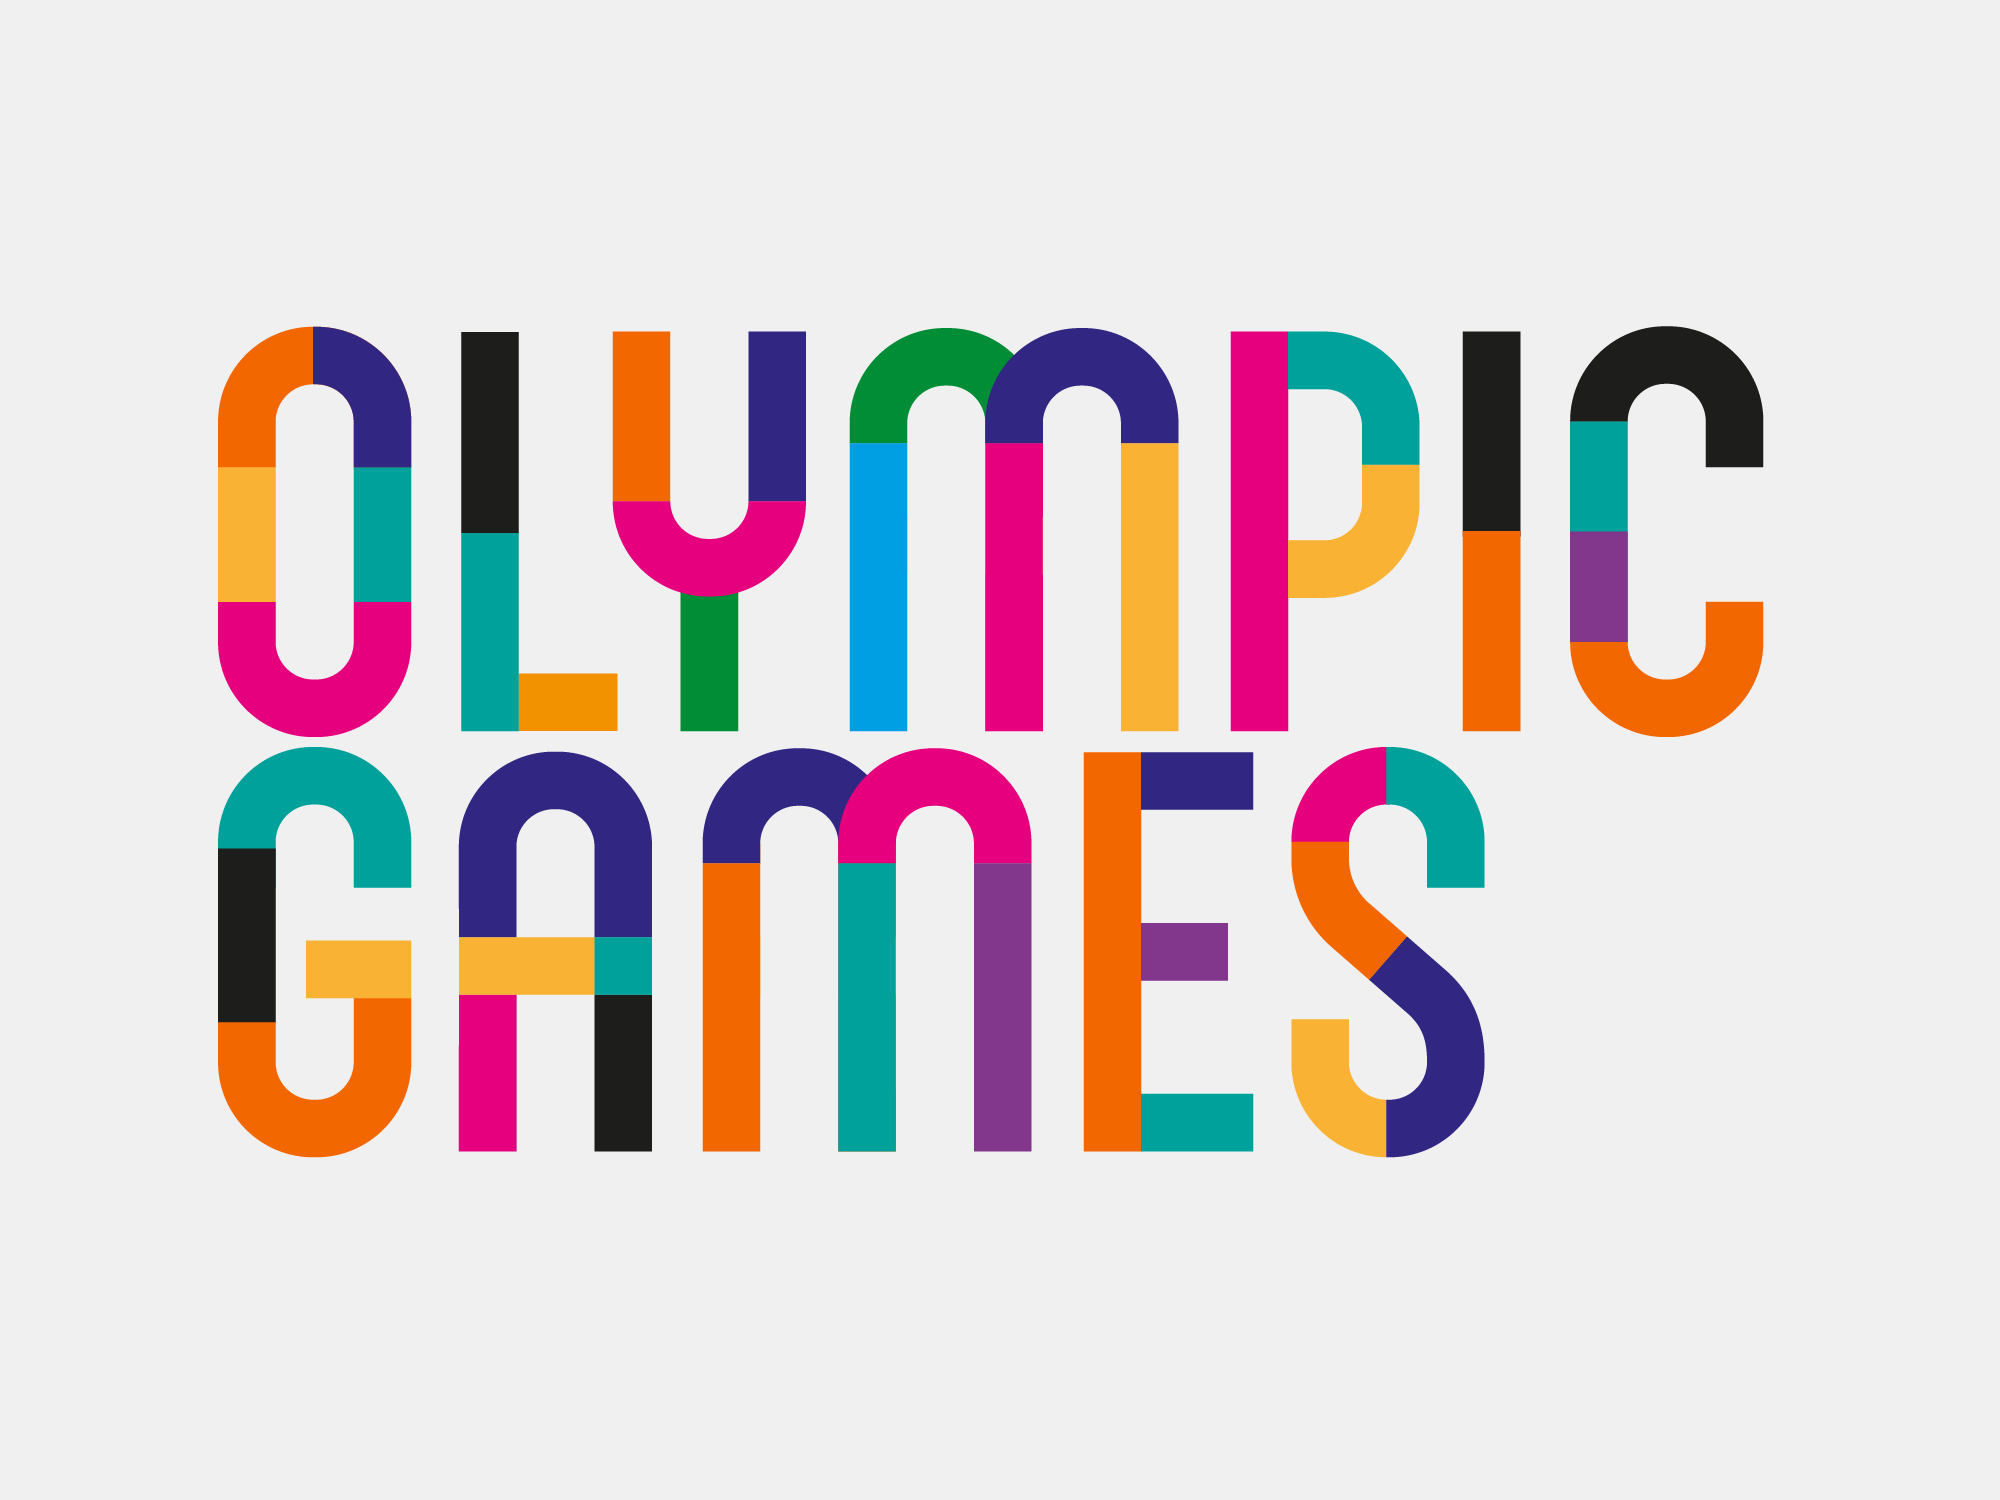 Cimero Pro Olympic Games